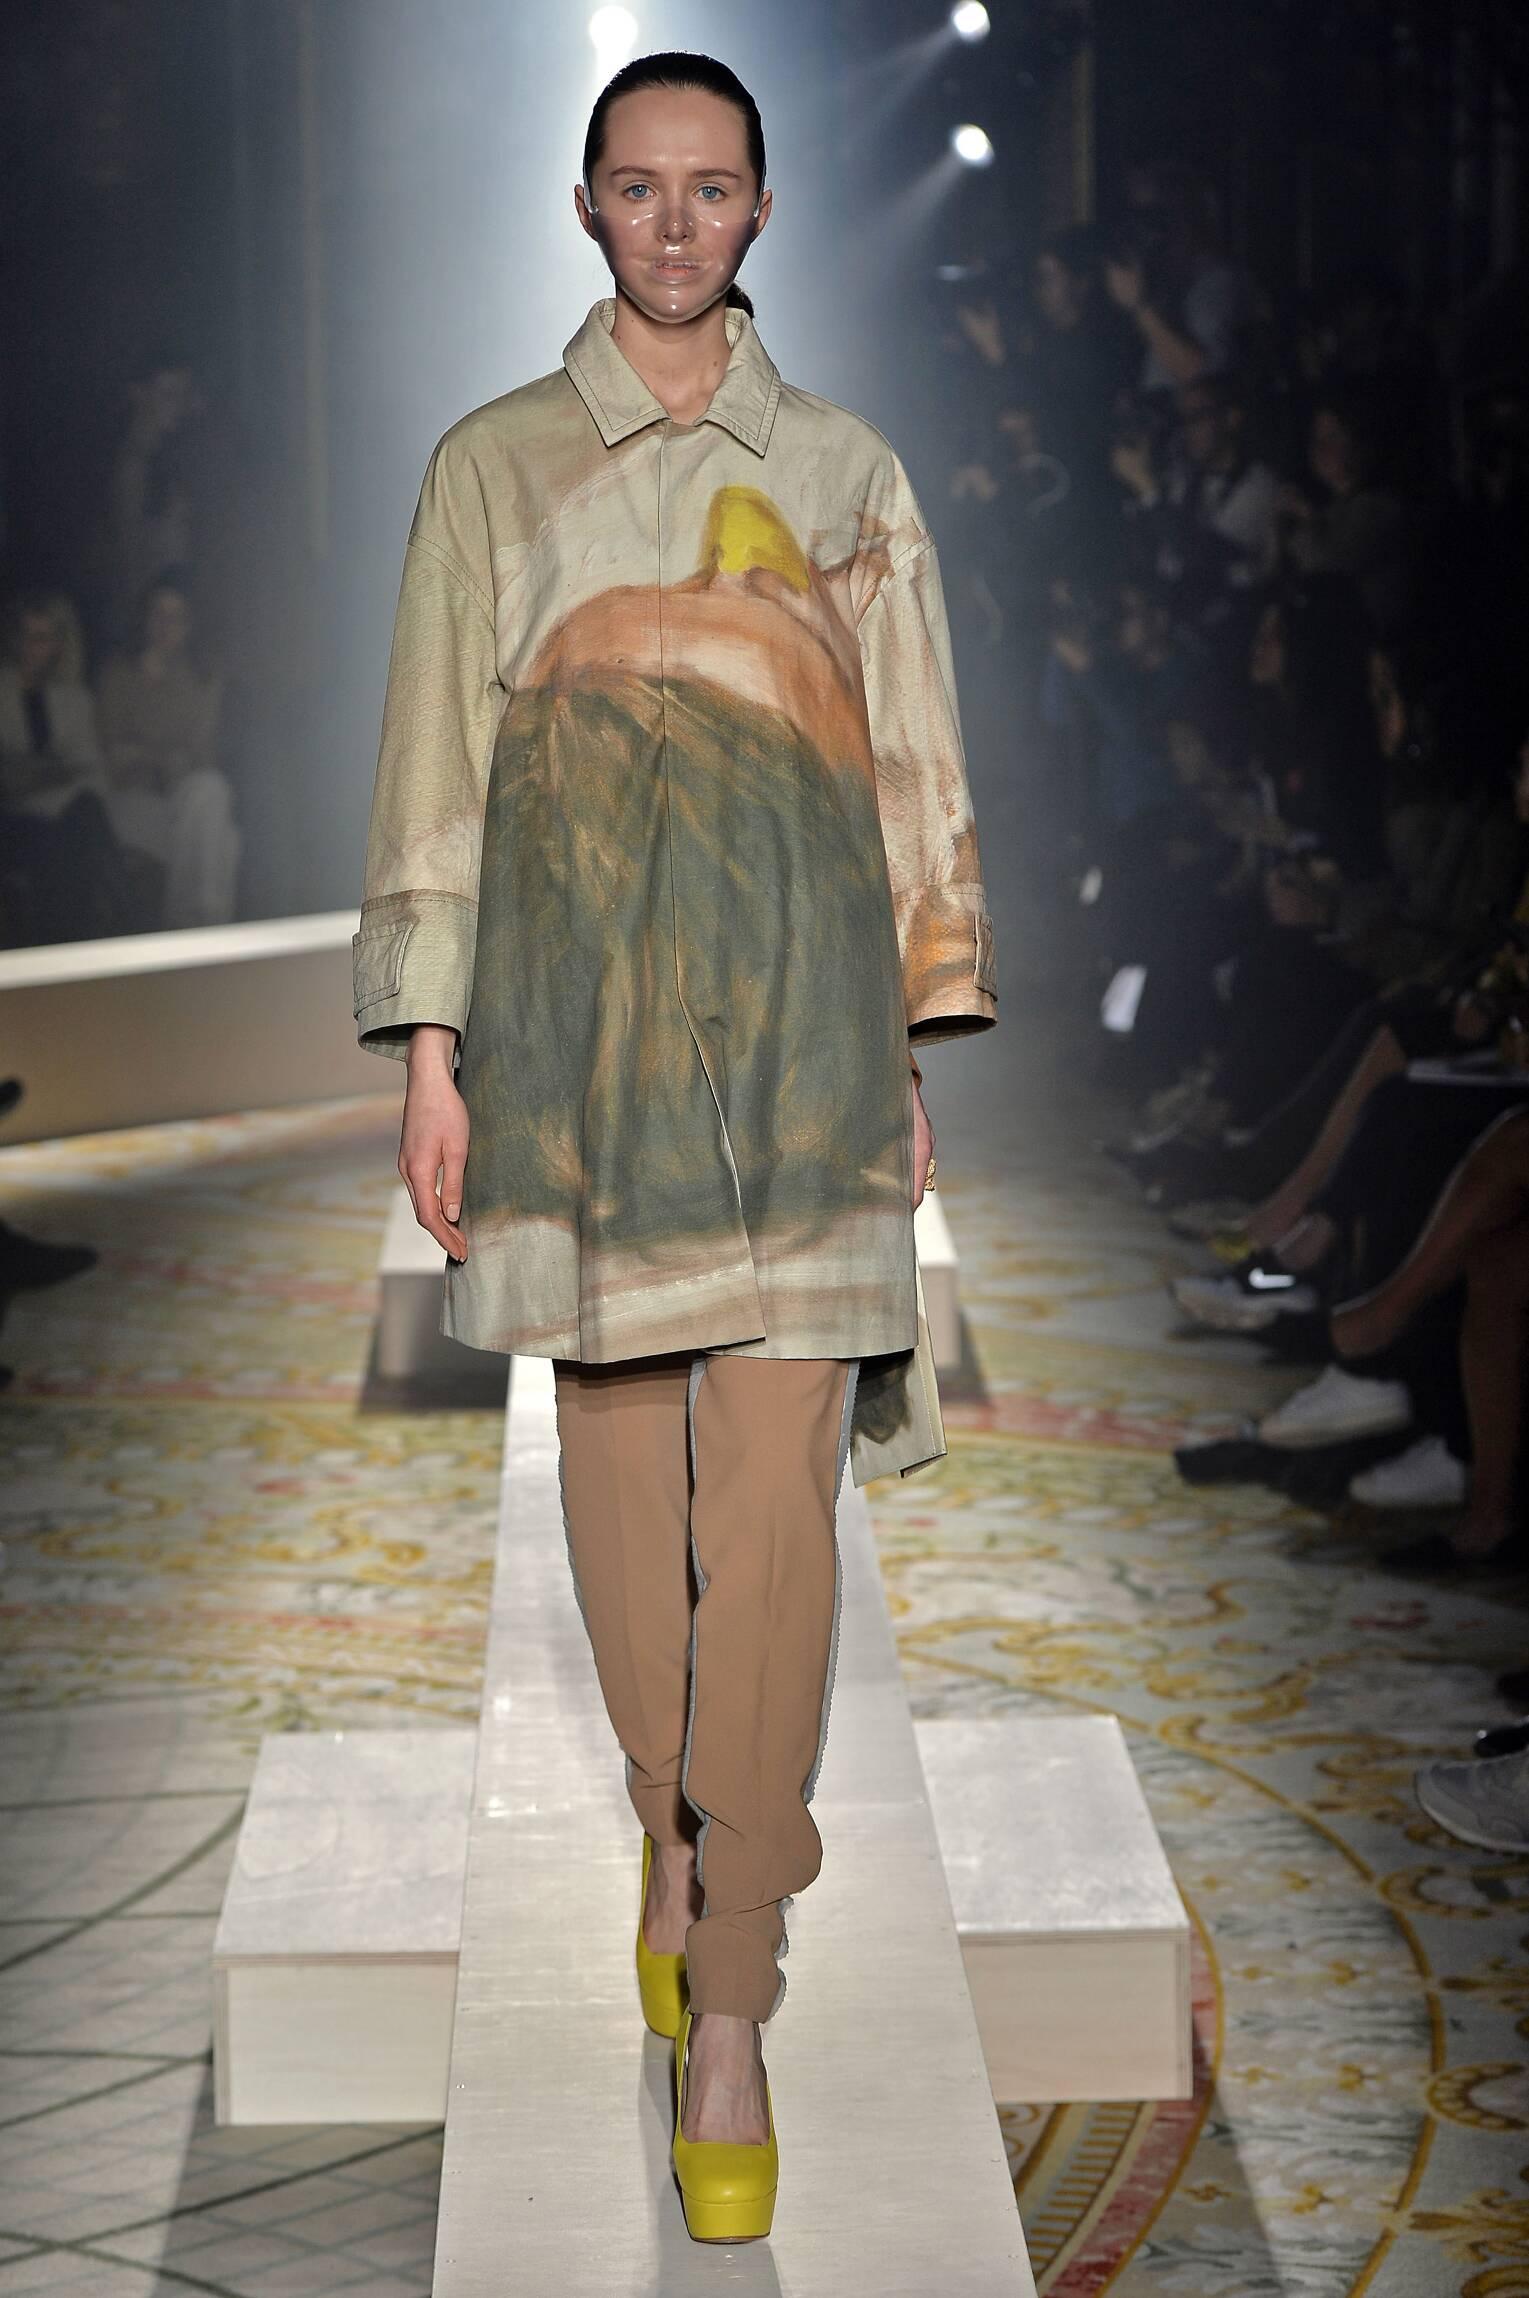 Fashion Womenswear Undercover Collection Catwalk